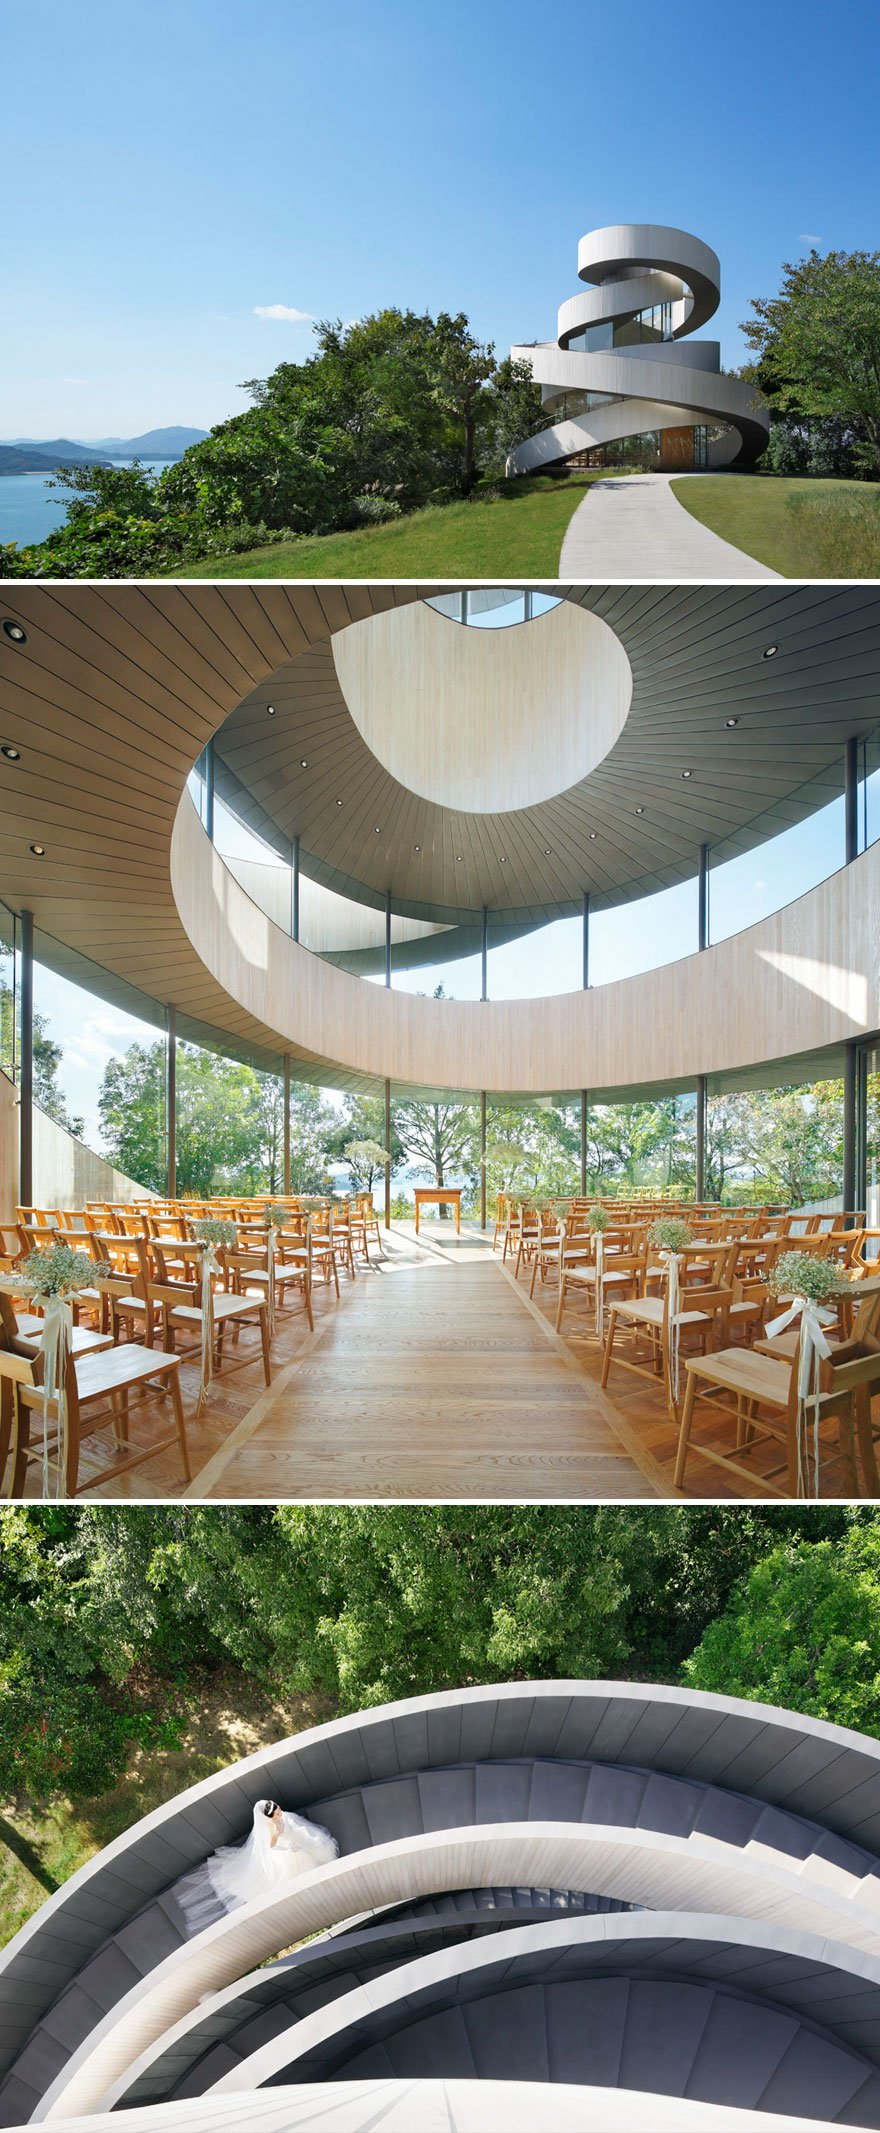 amazing-modern-japanese-architecture-15-57e256b2a856c__880